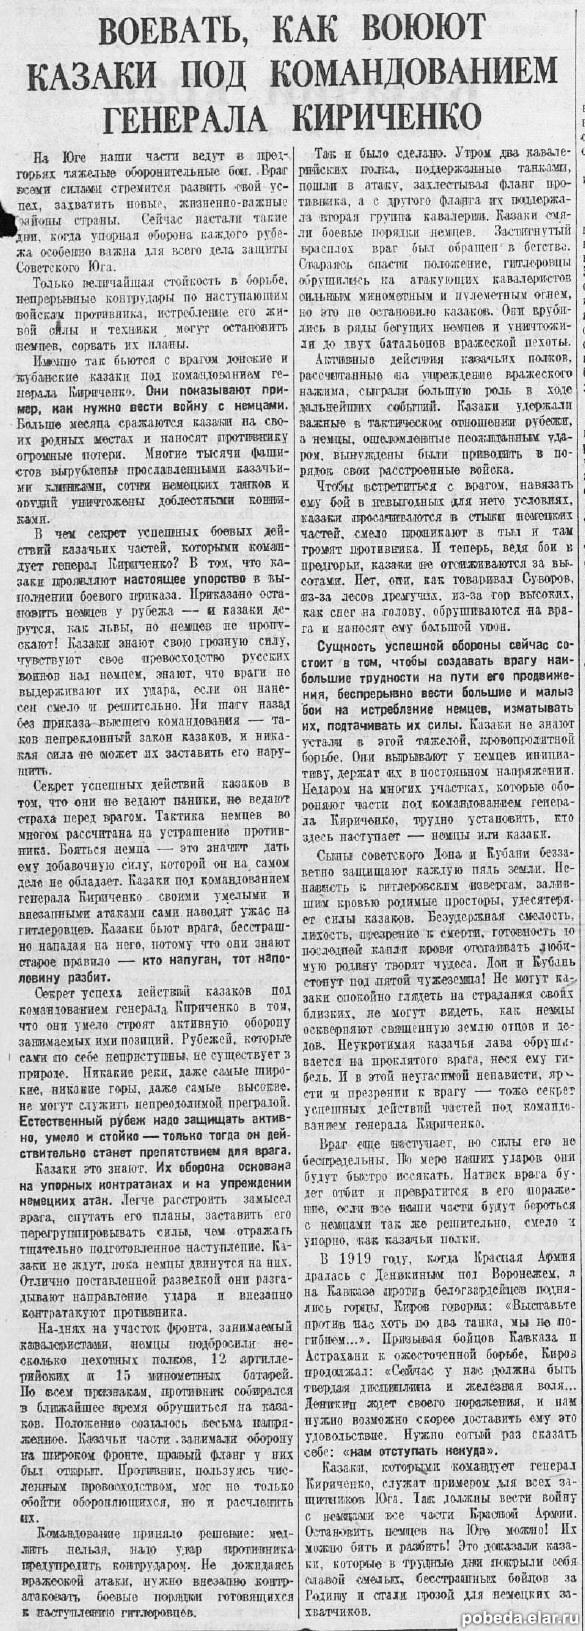 http://pobeda.elar.ru/images/kavkaz/1-9.jpg